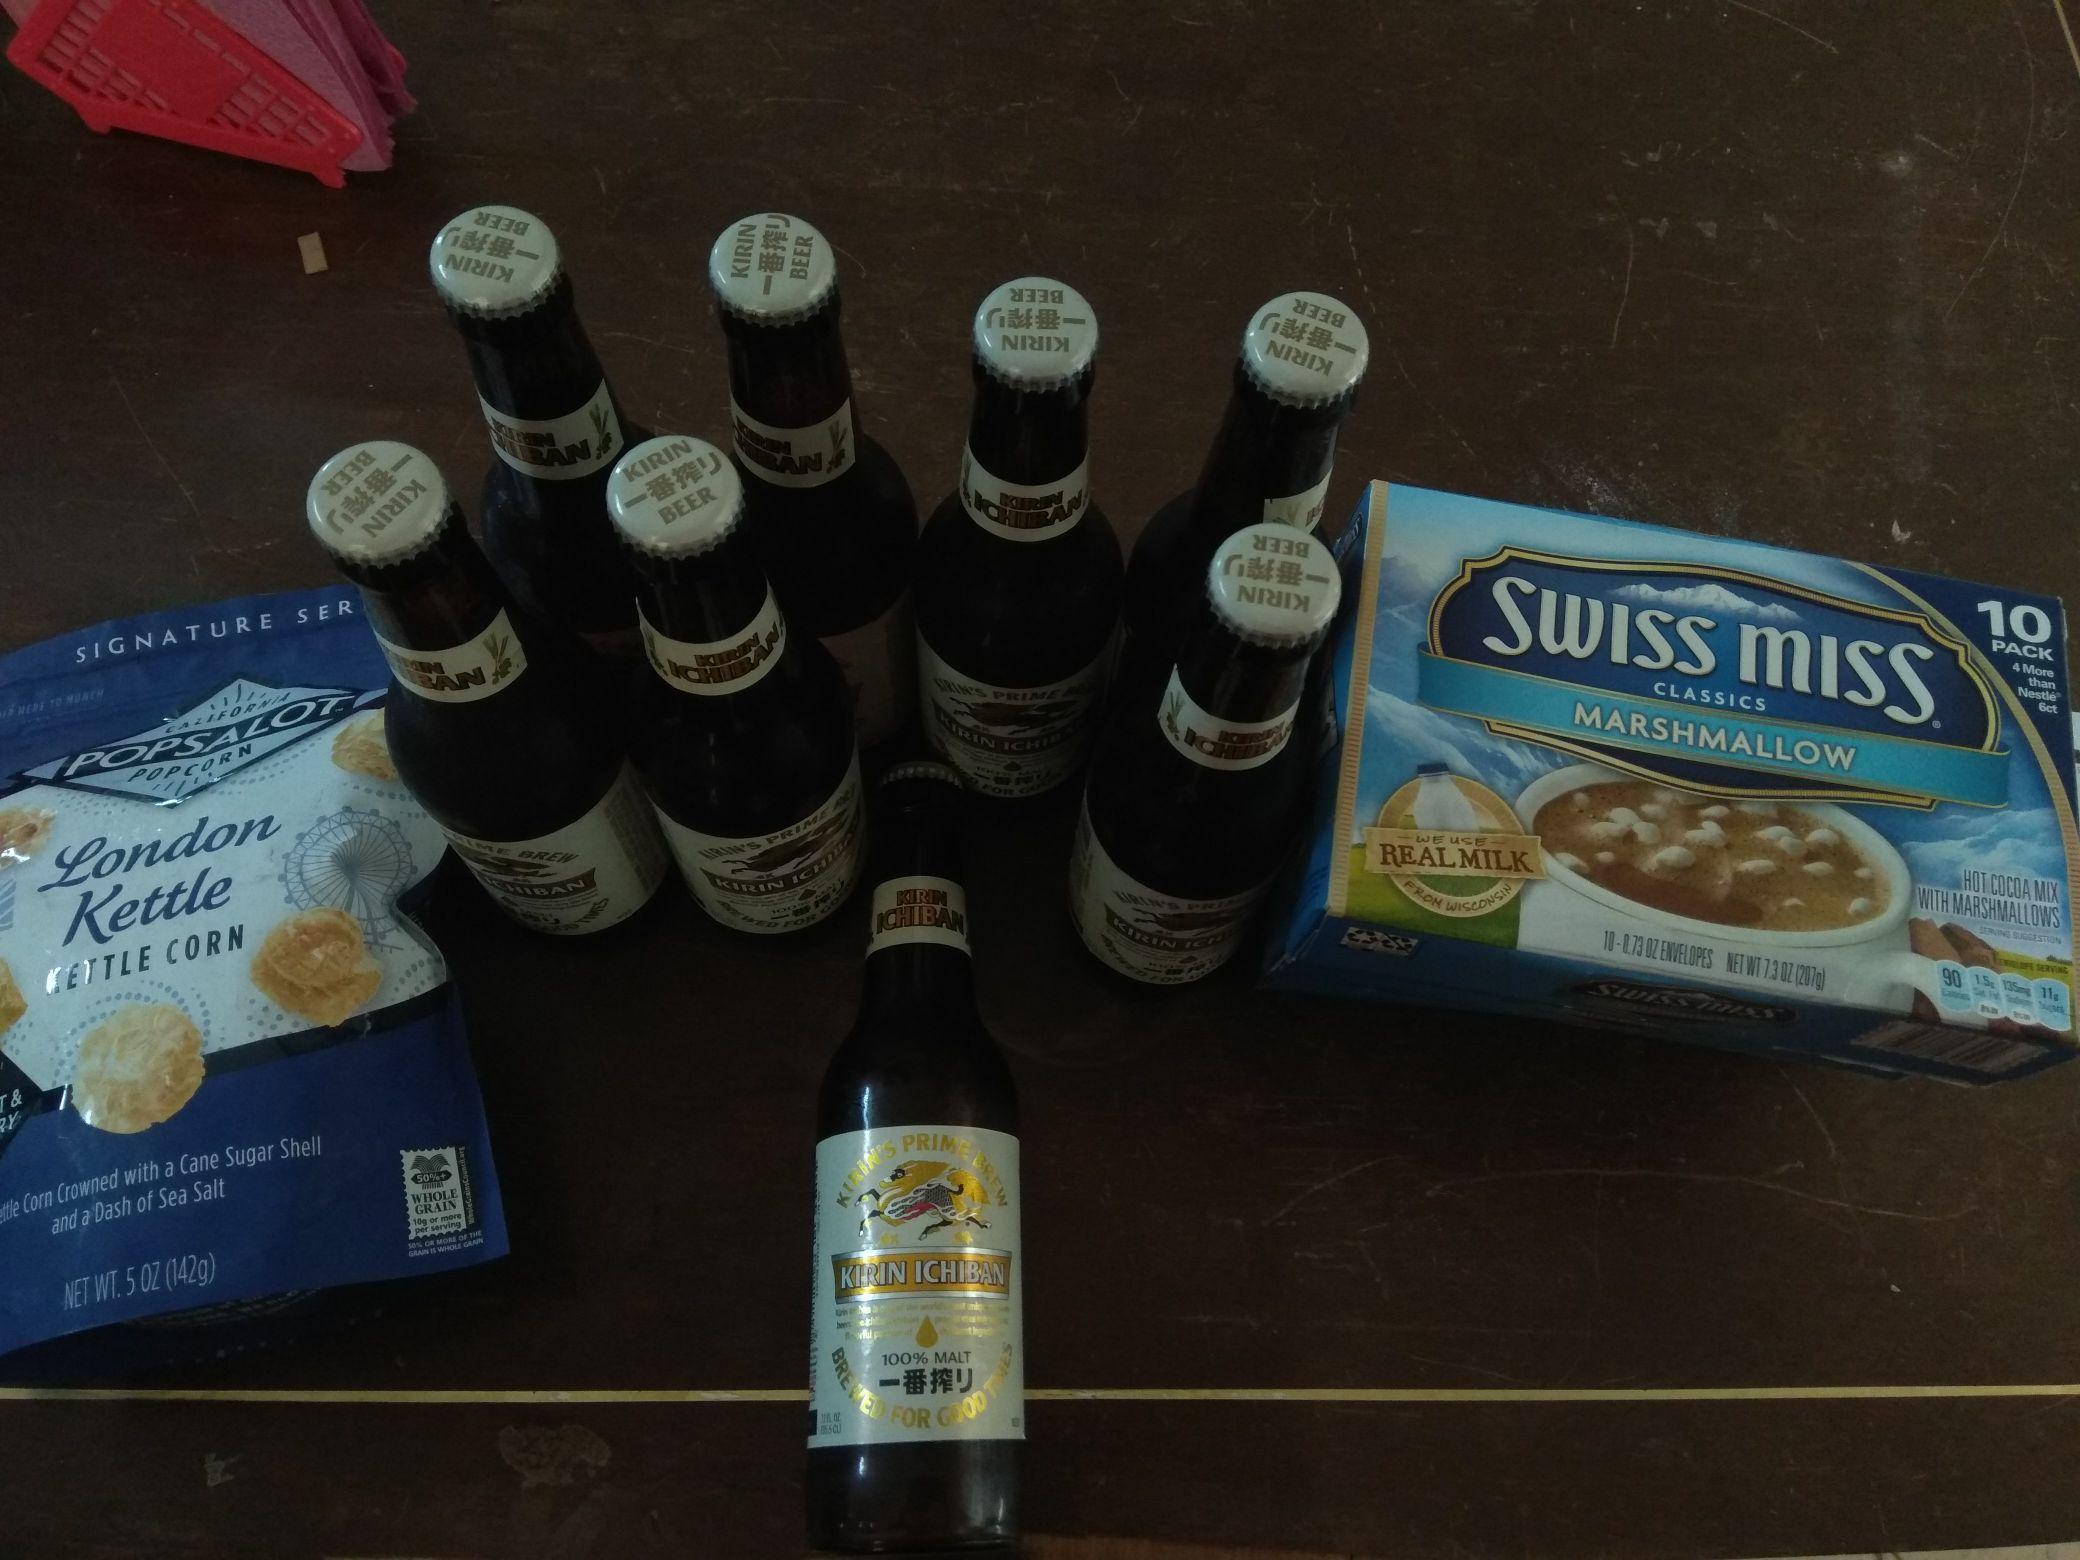 Chedraui Campeche Santa Ana: Cerveza Kirin Ichiban: $6.60, Palomitas Popsalot: $4.50, Polvo para chocolate Swiss Miss- Marshmallow: $3.60